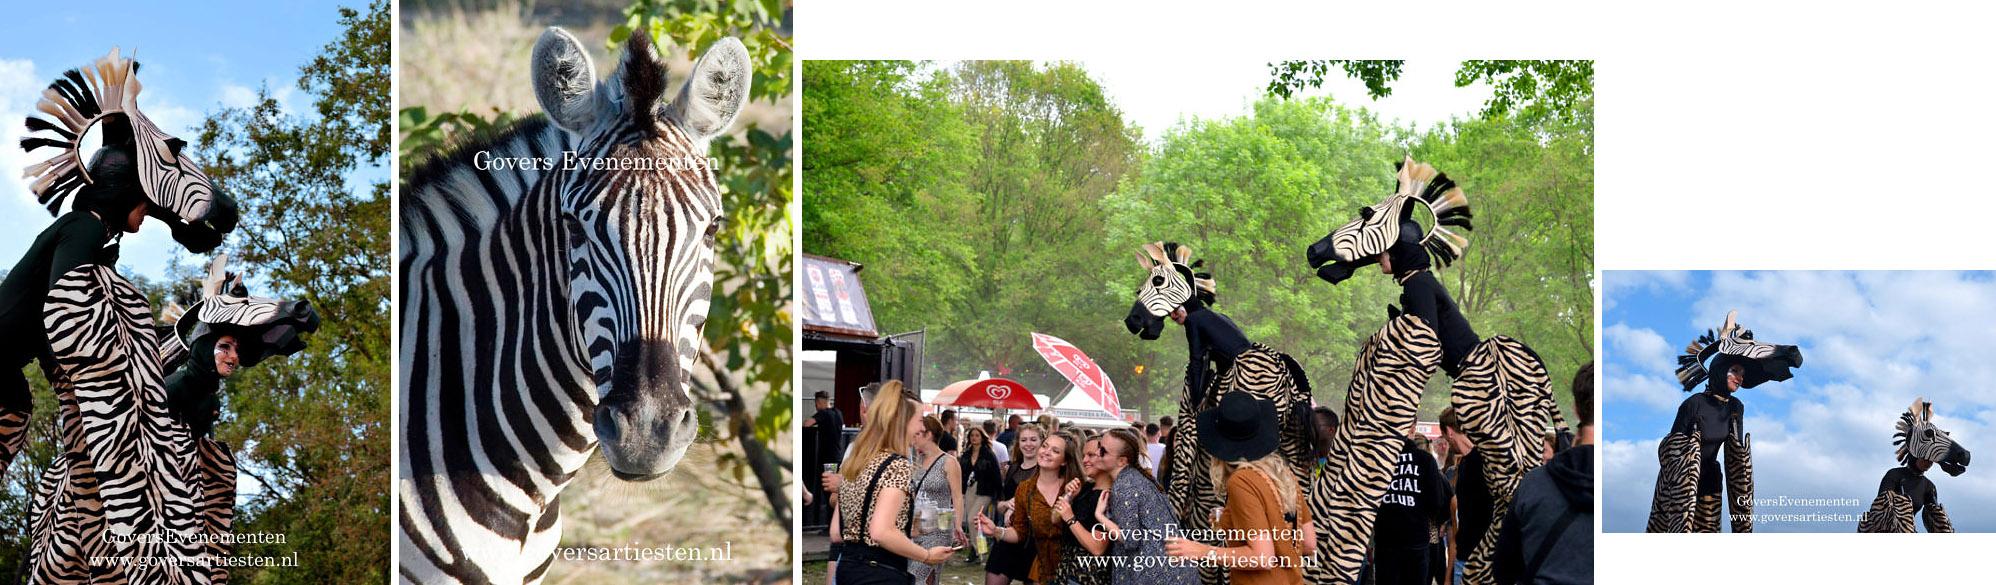 Zebra, zebra's. dieren op stelten, steltacts, stiltlife, steltenact, steltenacts, steltentheater, artiesten boeken, artiestenburo, artiestenbureau, straattheater op stelten, dierentuin, dierenact, dierentheater, theater voor kinderen, straattheateract, Govers Evenementen, evenement organiseren, thema act, straatfestival, www.goversartiesten.nl